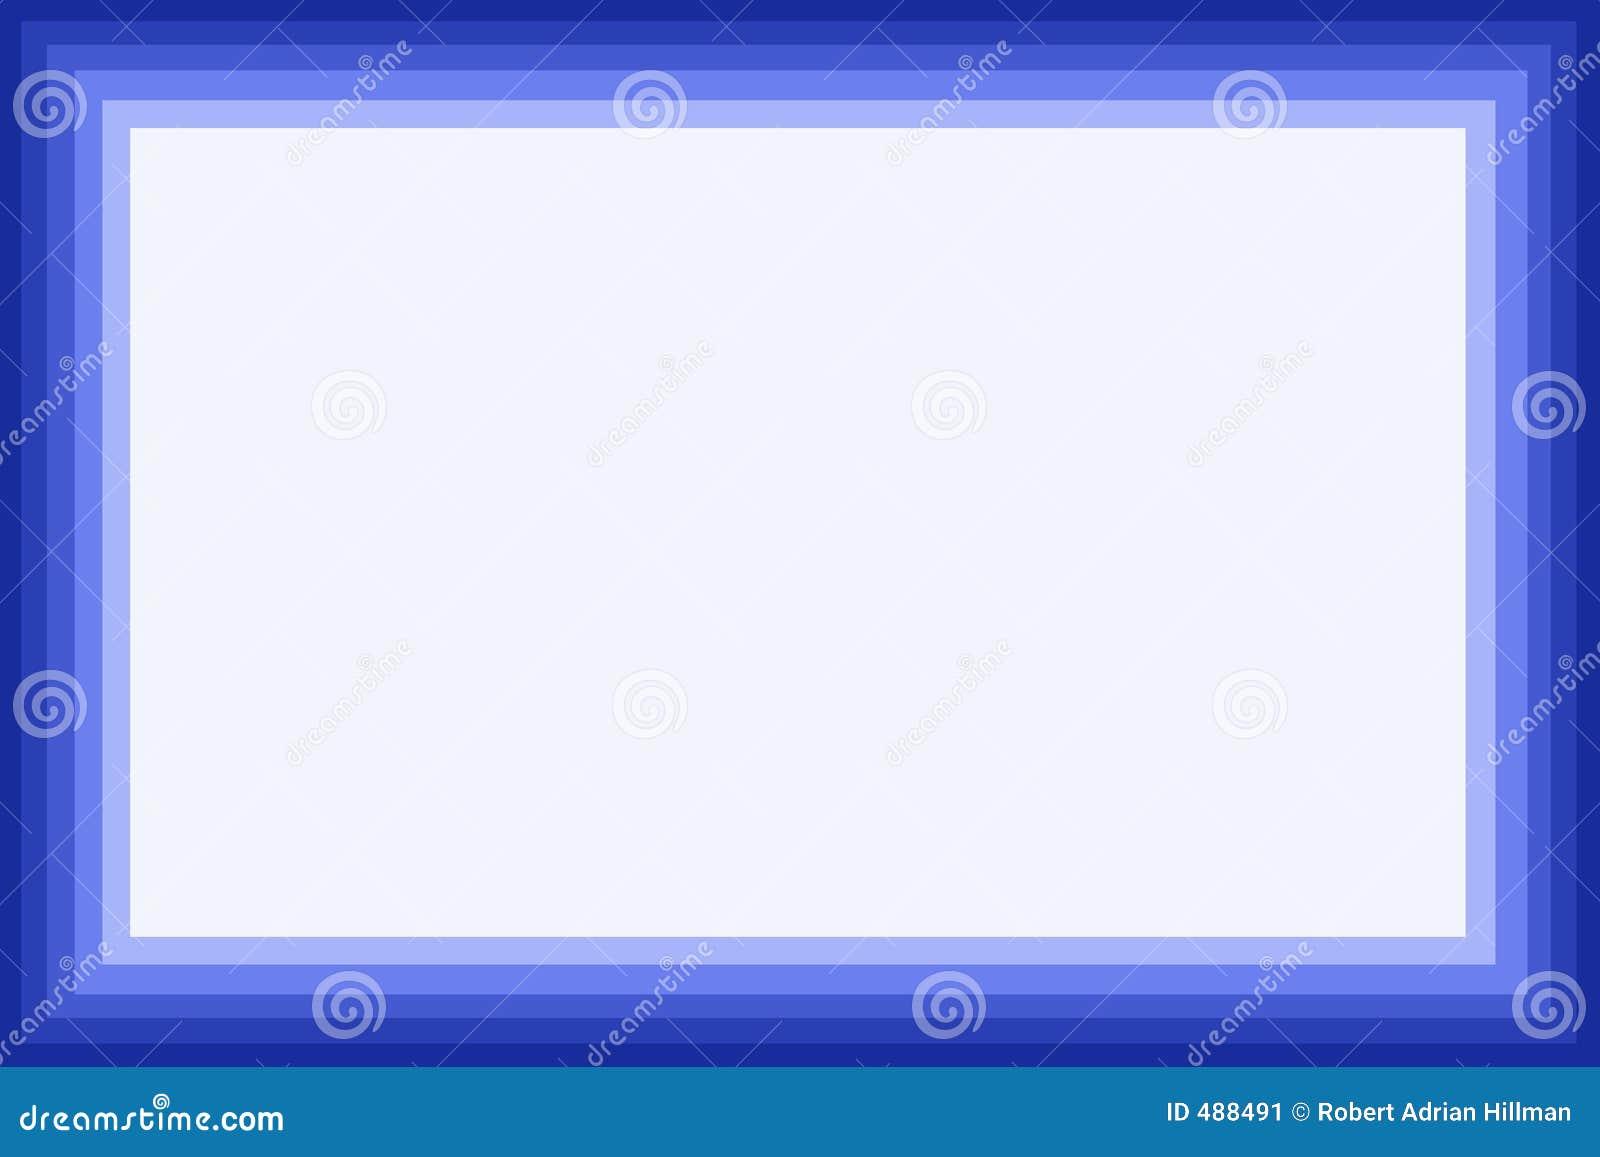 blue border stock illustration illustration of rectangle 488491